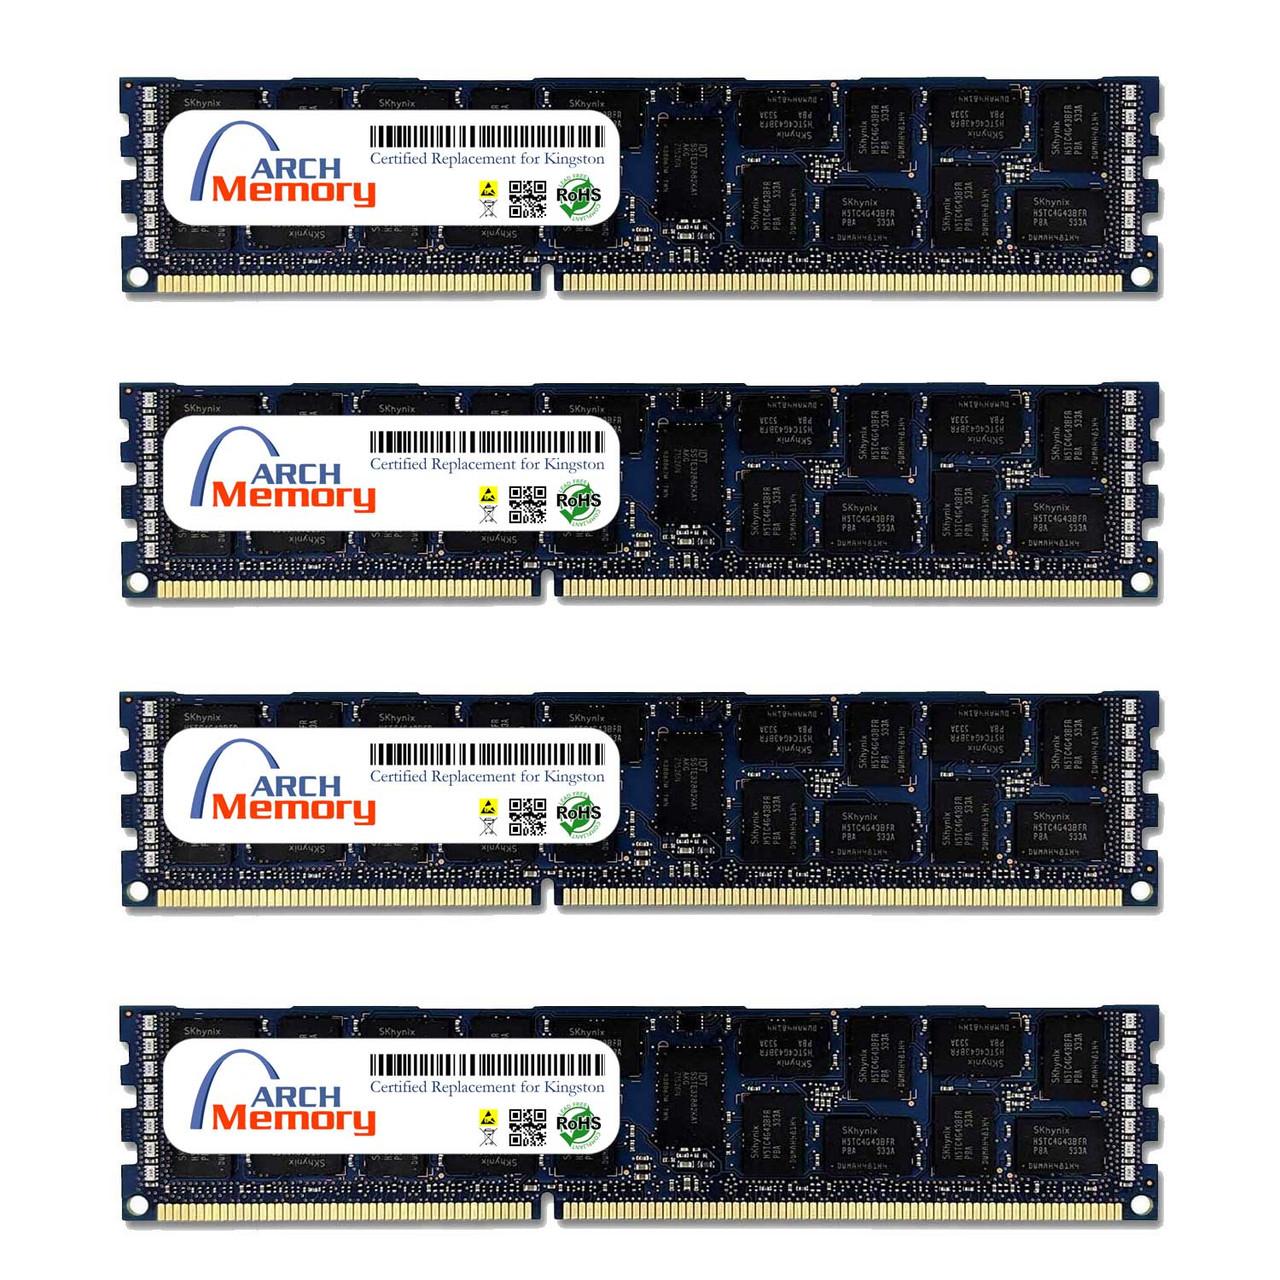 16GB KTH-PL316K4/64G 6 Kit (4 x 16 GB) DDR3 1600MHz 240-Pin ECC RDIMM Server RAM | Kingston Replacement Memory